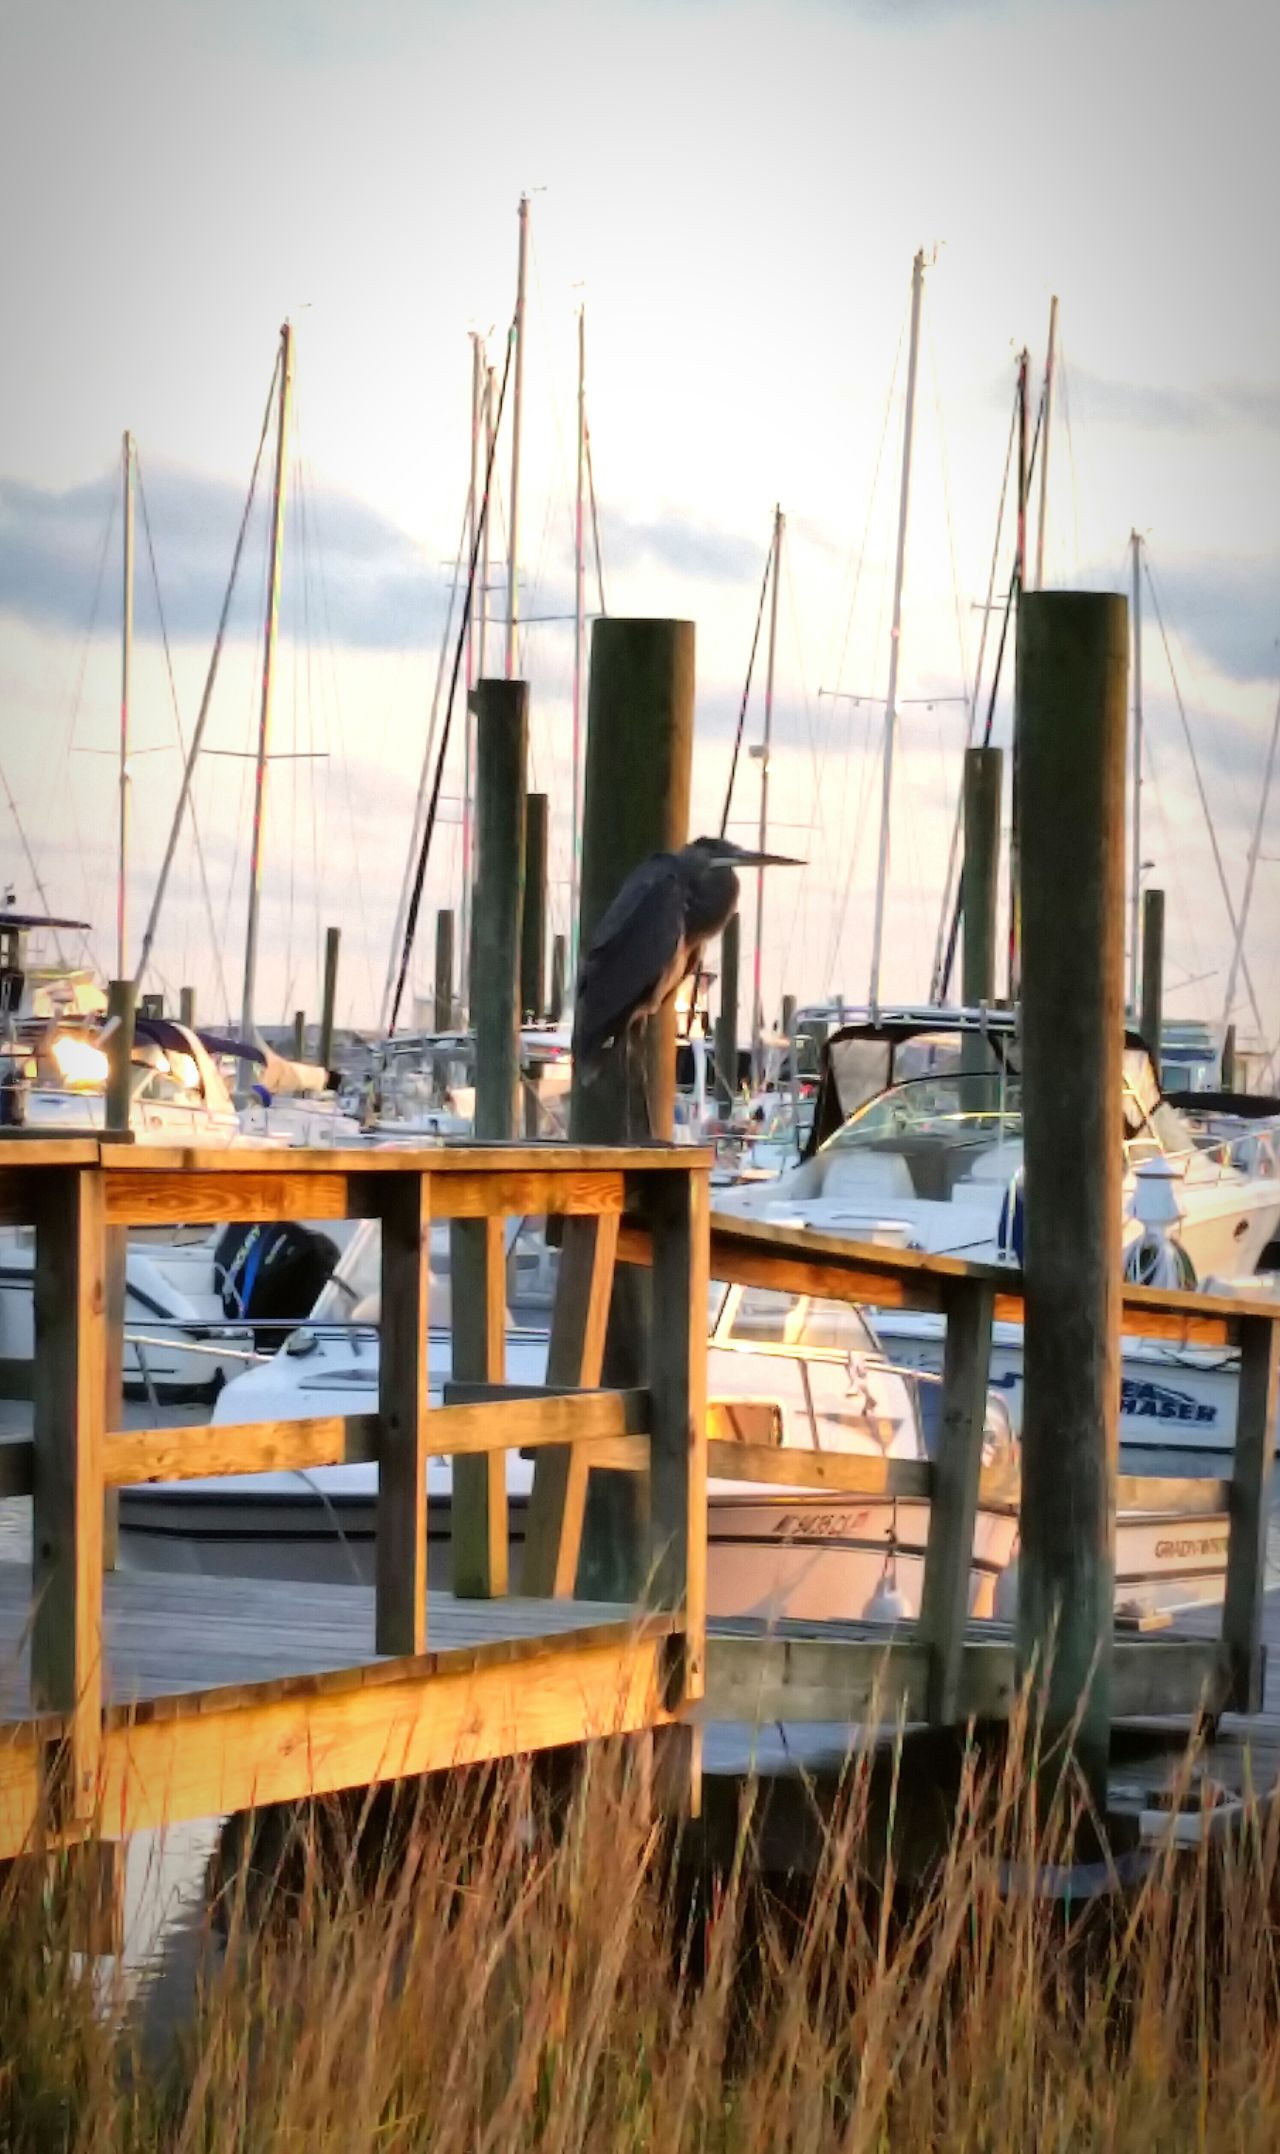 Nautical Vessel Harbor Transportation Sea Water Moored Mode Of Transport Sailboat Mast Outdoors No People City Beach Sailing Ship Day Close-up Yacht Birds Wildlife Bird Photography Bird Watching